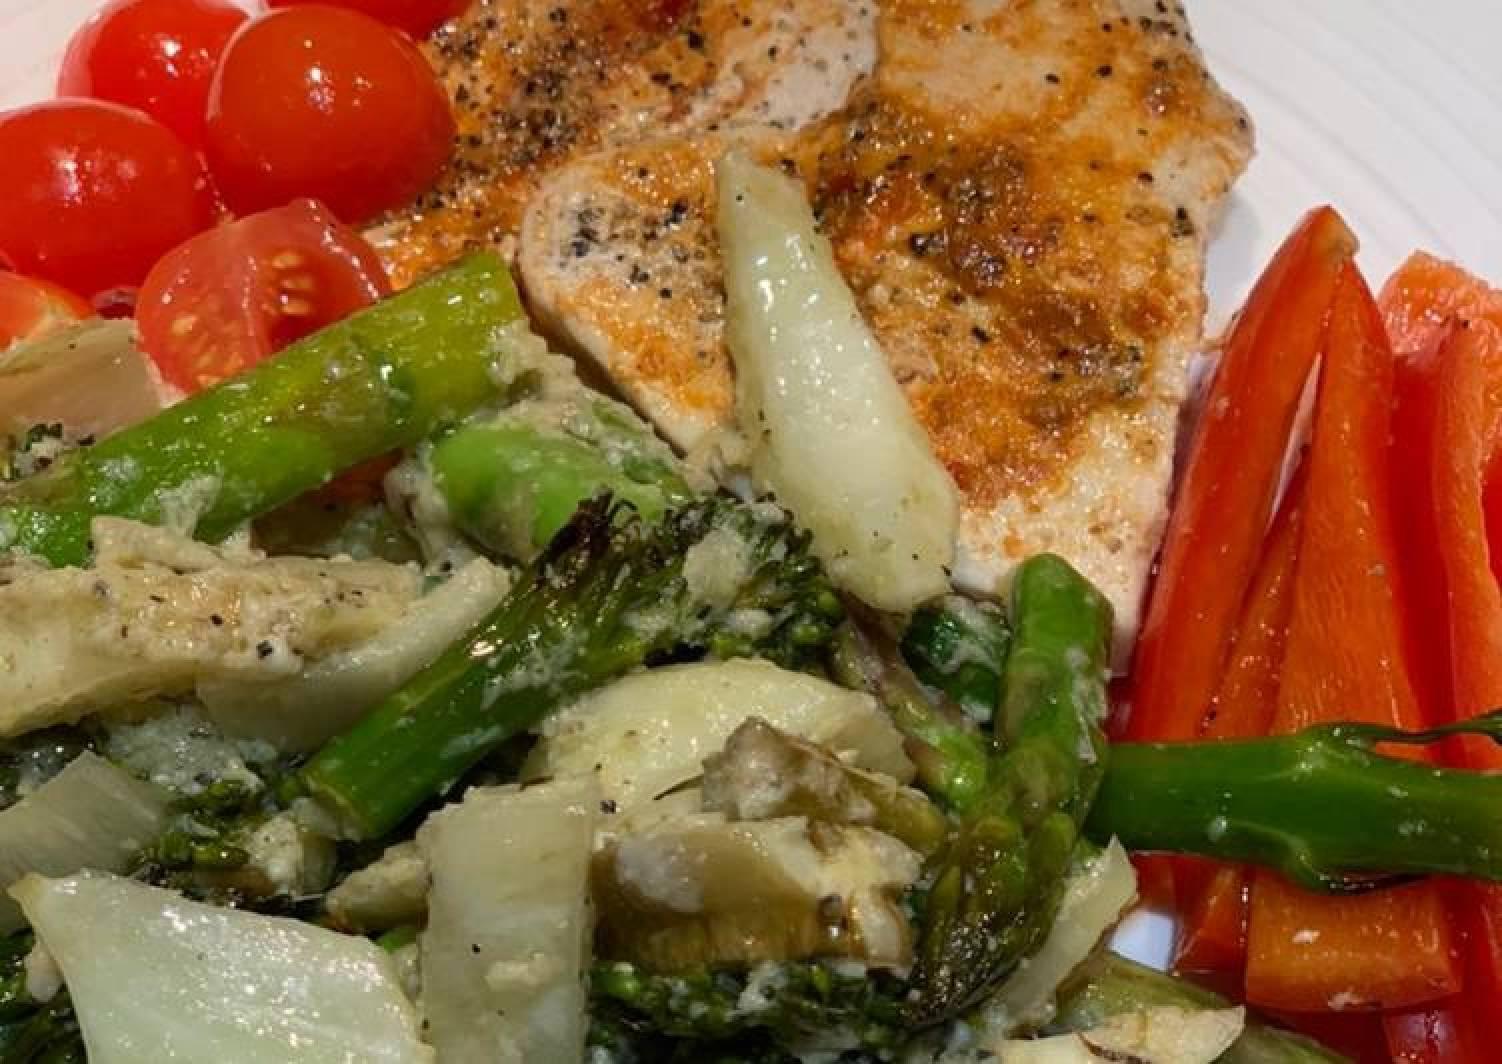 Harissa turkey steaks with fennel/broccoli/asparagus and lemon-pecorino sauce for Jamo